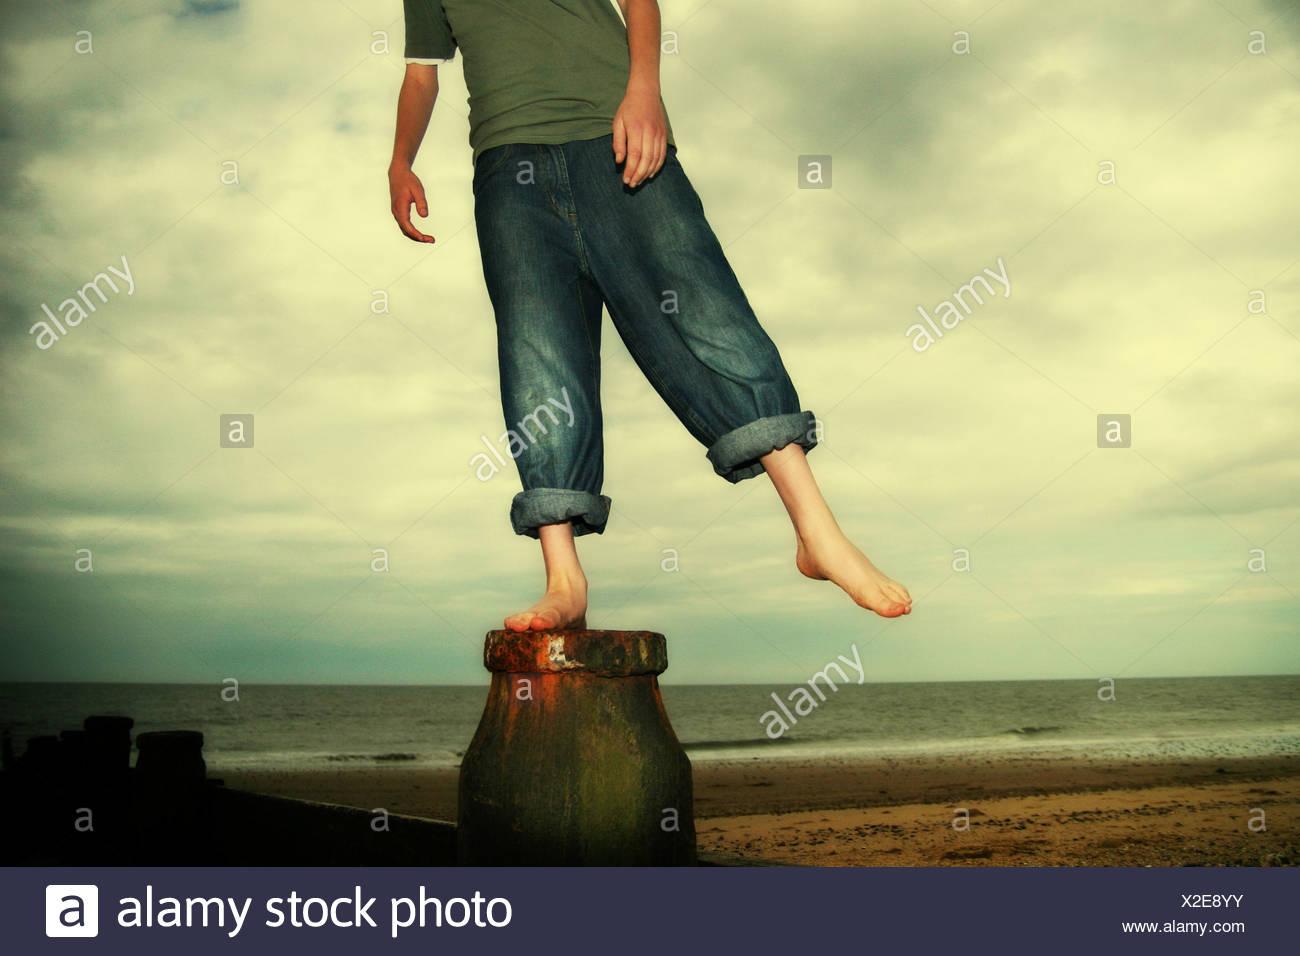 Balance 2 Stockbild